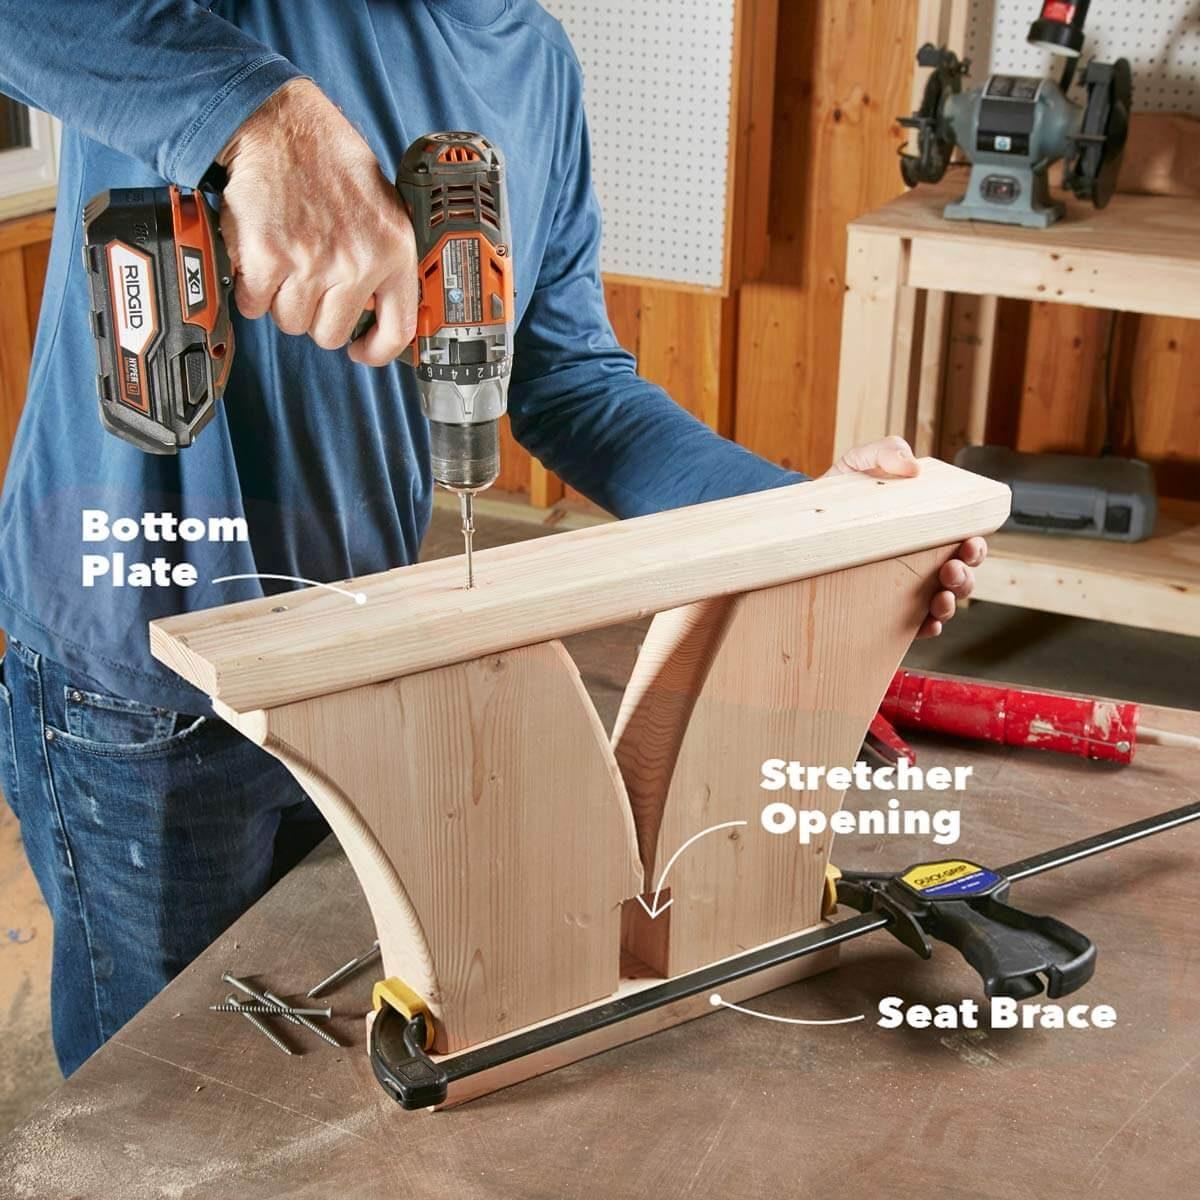 vinking bench assemble legs